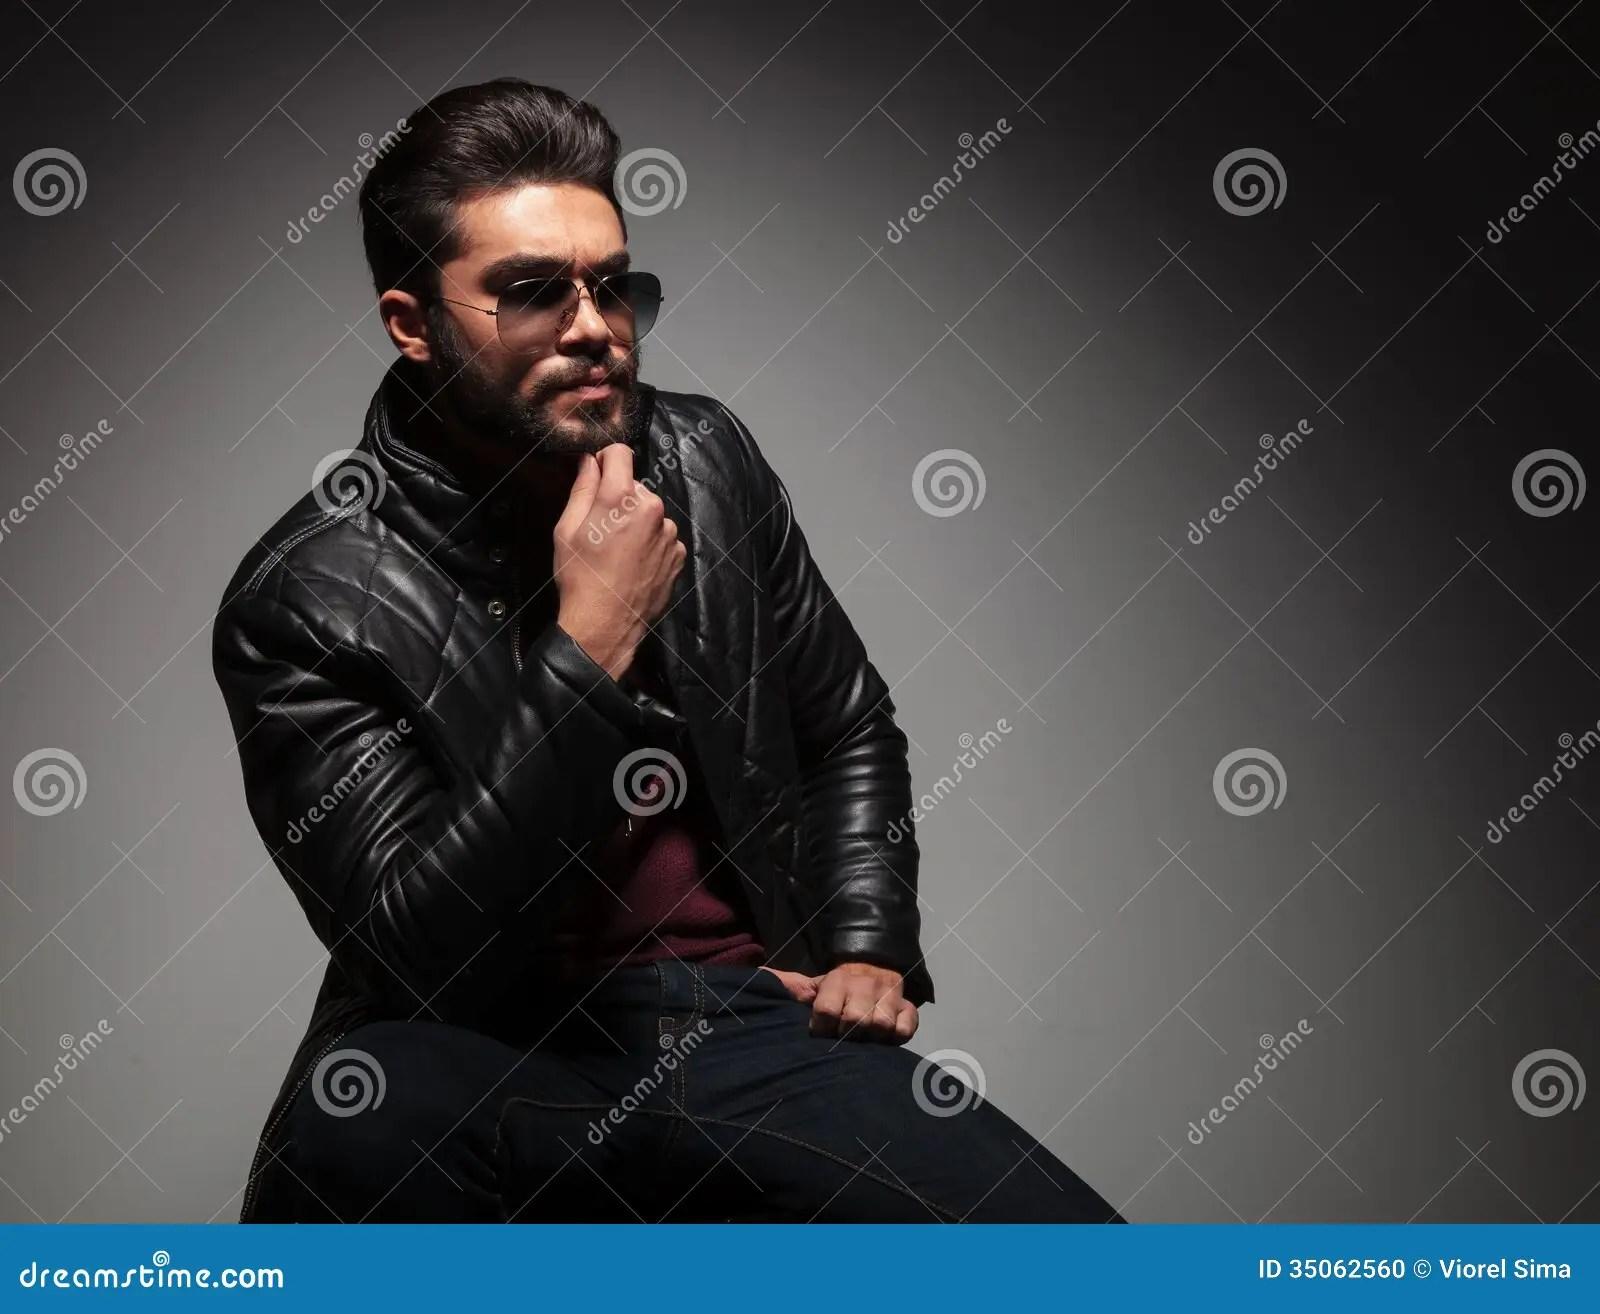 Dramatic Young Thoughtful Fashion Man With Long Beard